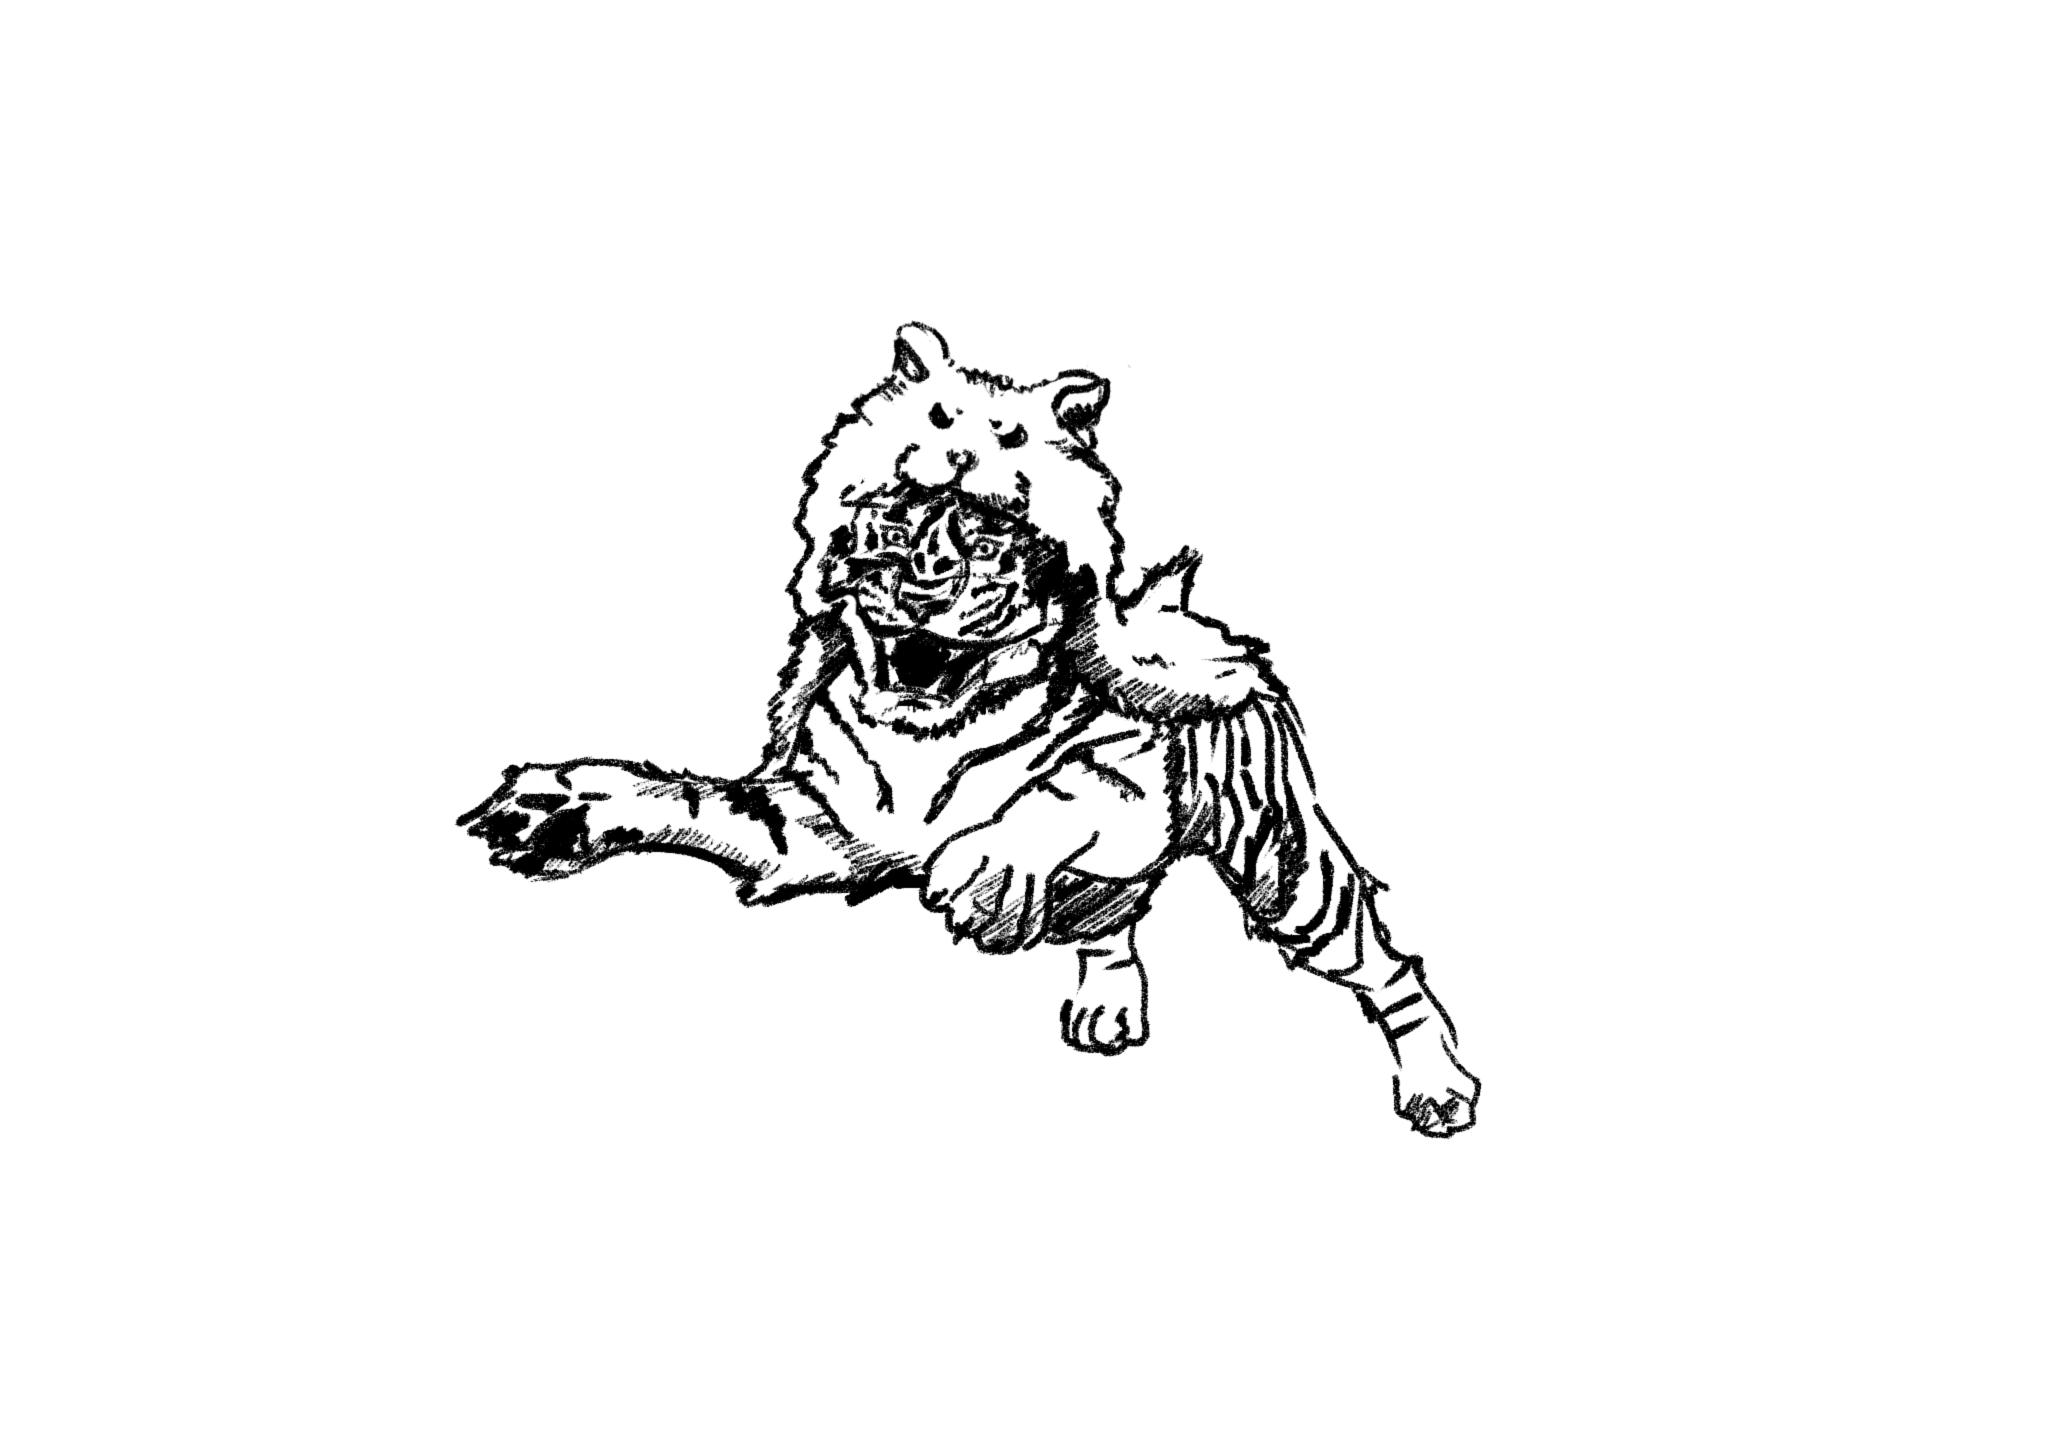 Не делайте из тигра хомячка